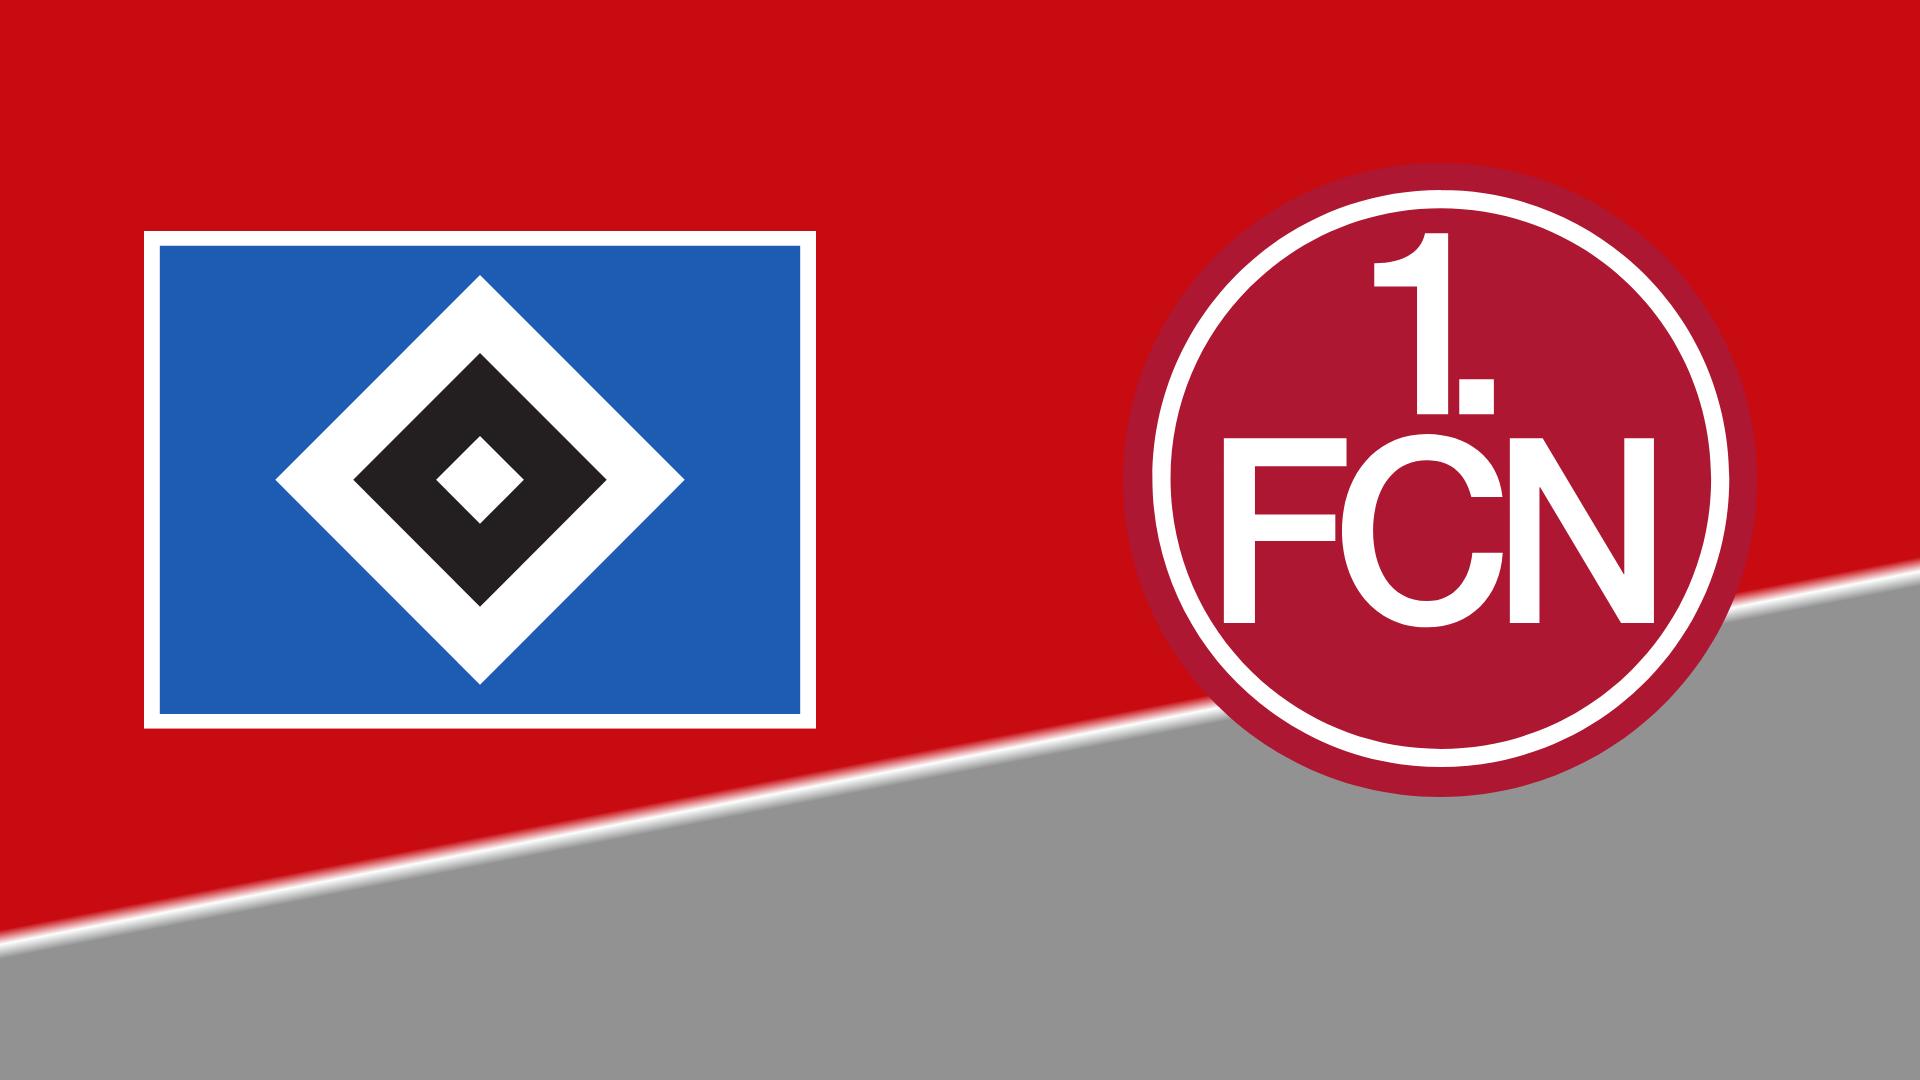 Live 2. BL: Hamburger SV - 1. FC Nürnberg, 8. Spieltag 26.09.2021 um 13:00 Uhr auf Sky Ticket